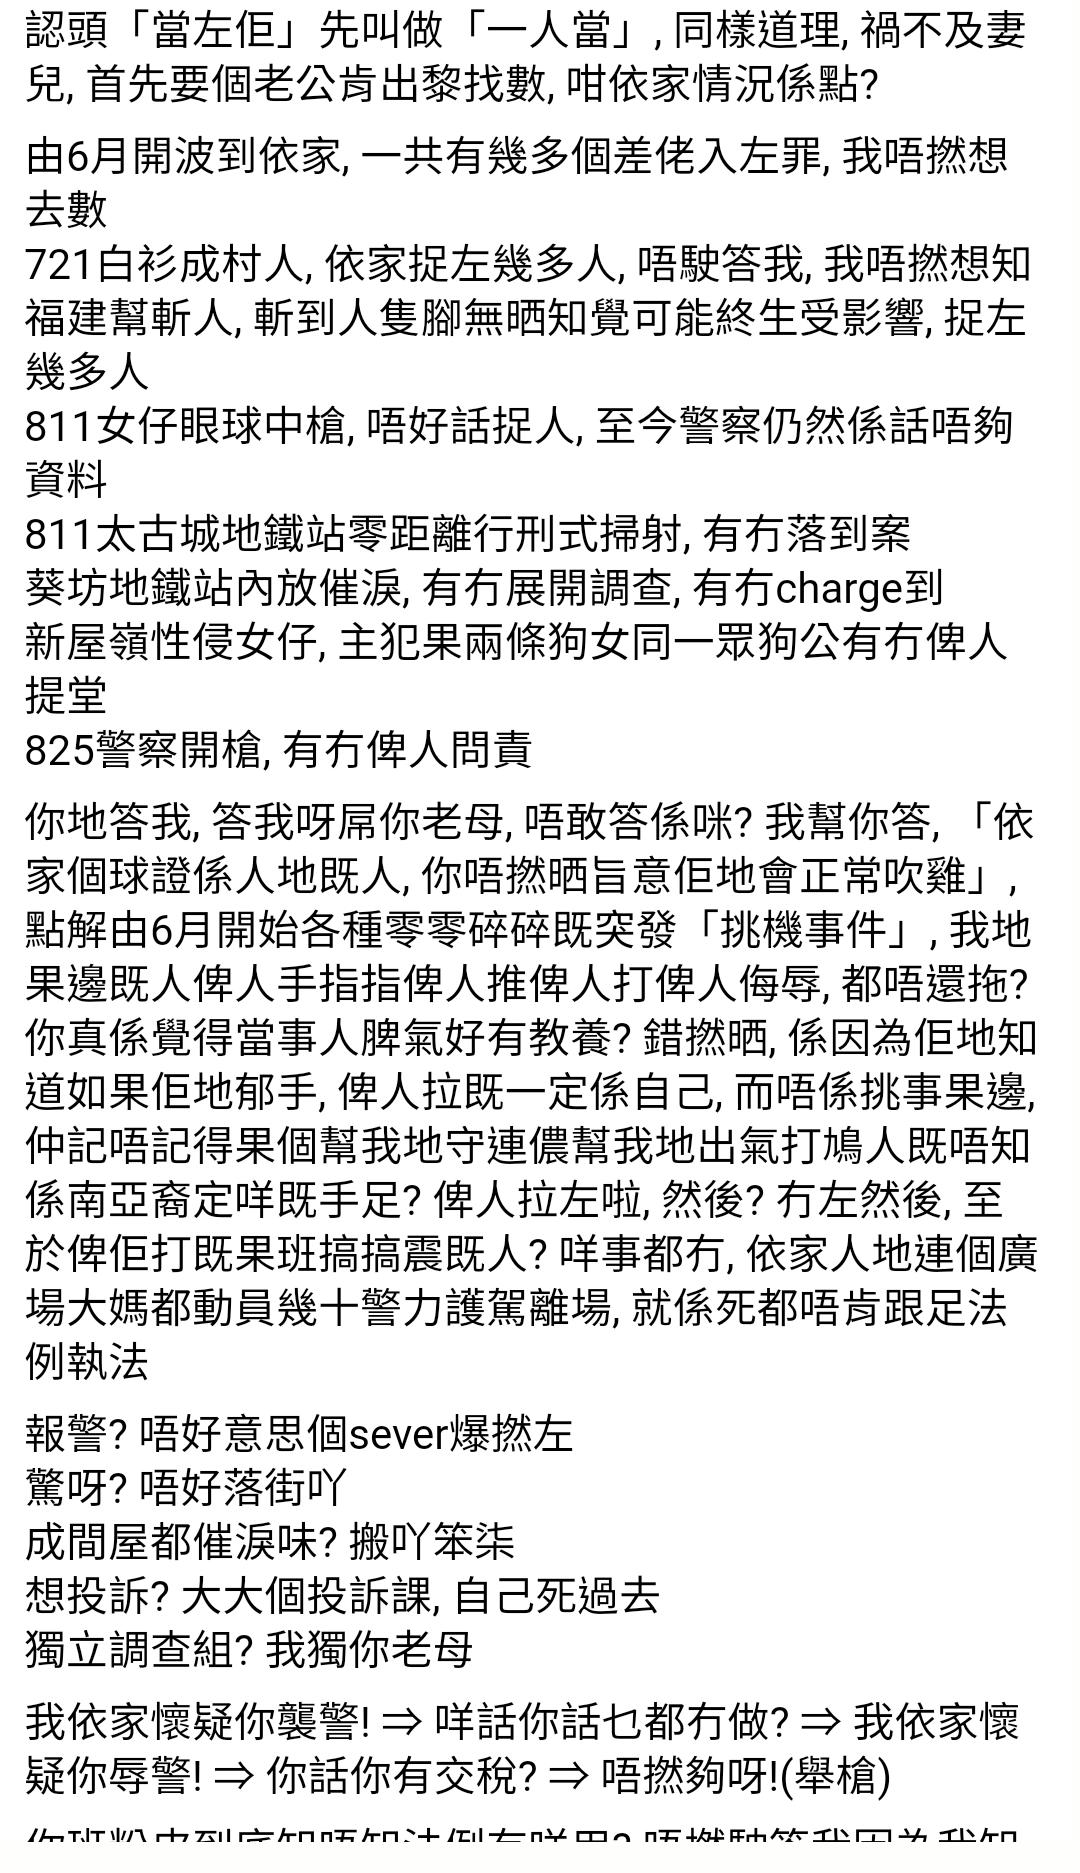 https://upload.cc/i1/2019/08/28/ZrE6bc.png